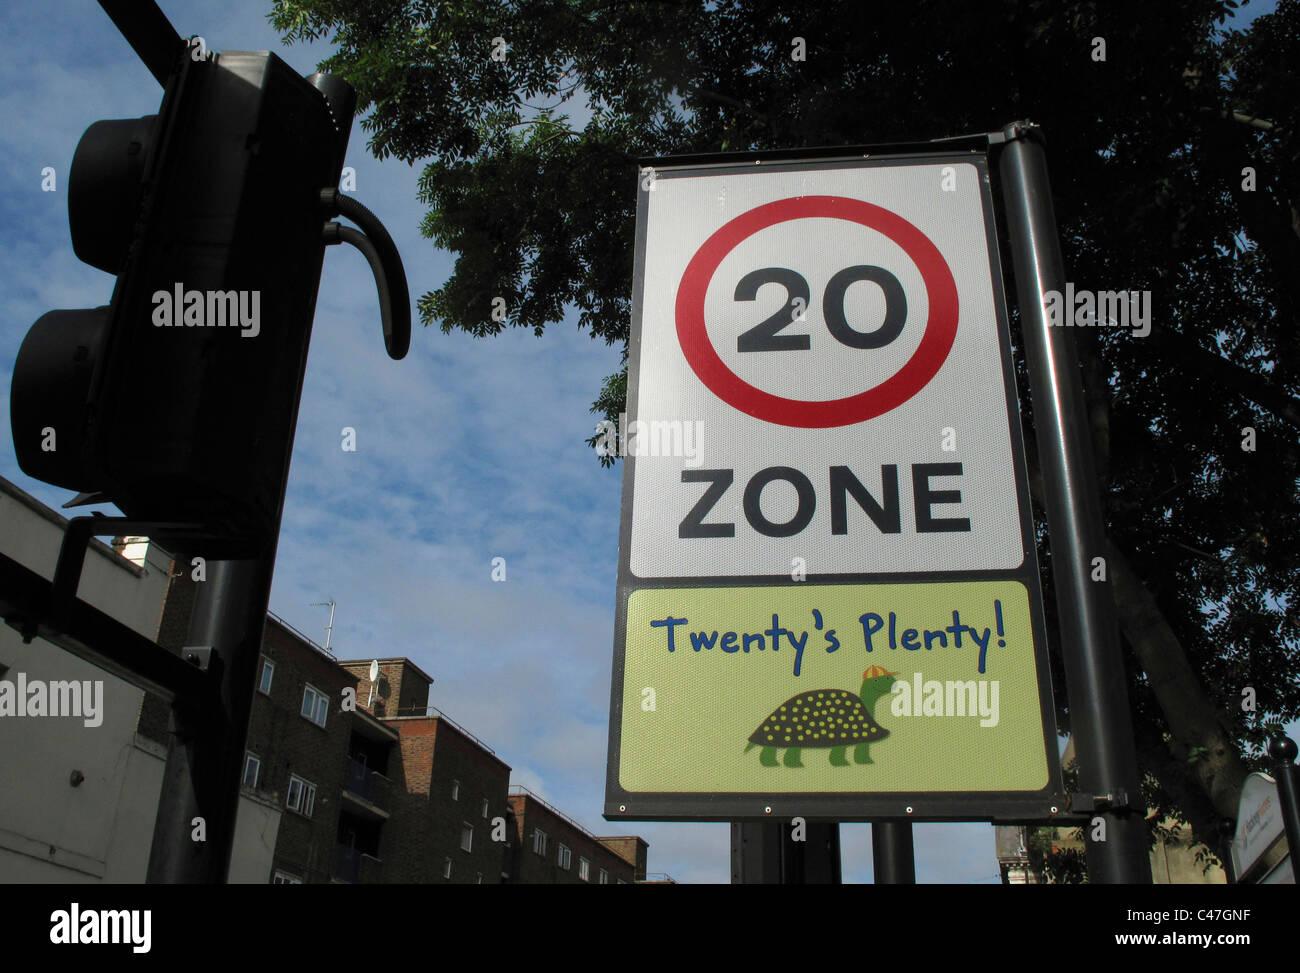 Twenty's plenty 20mph speed limit sign, Hackney, London - Stock Image